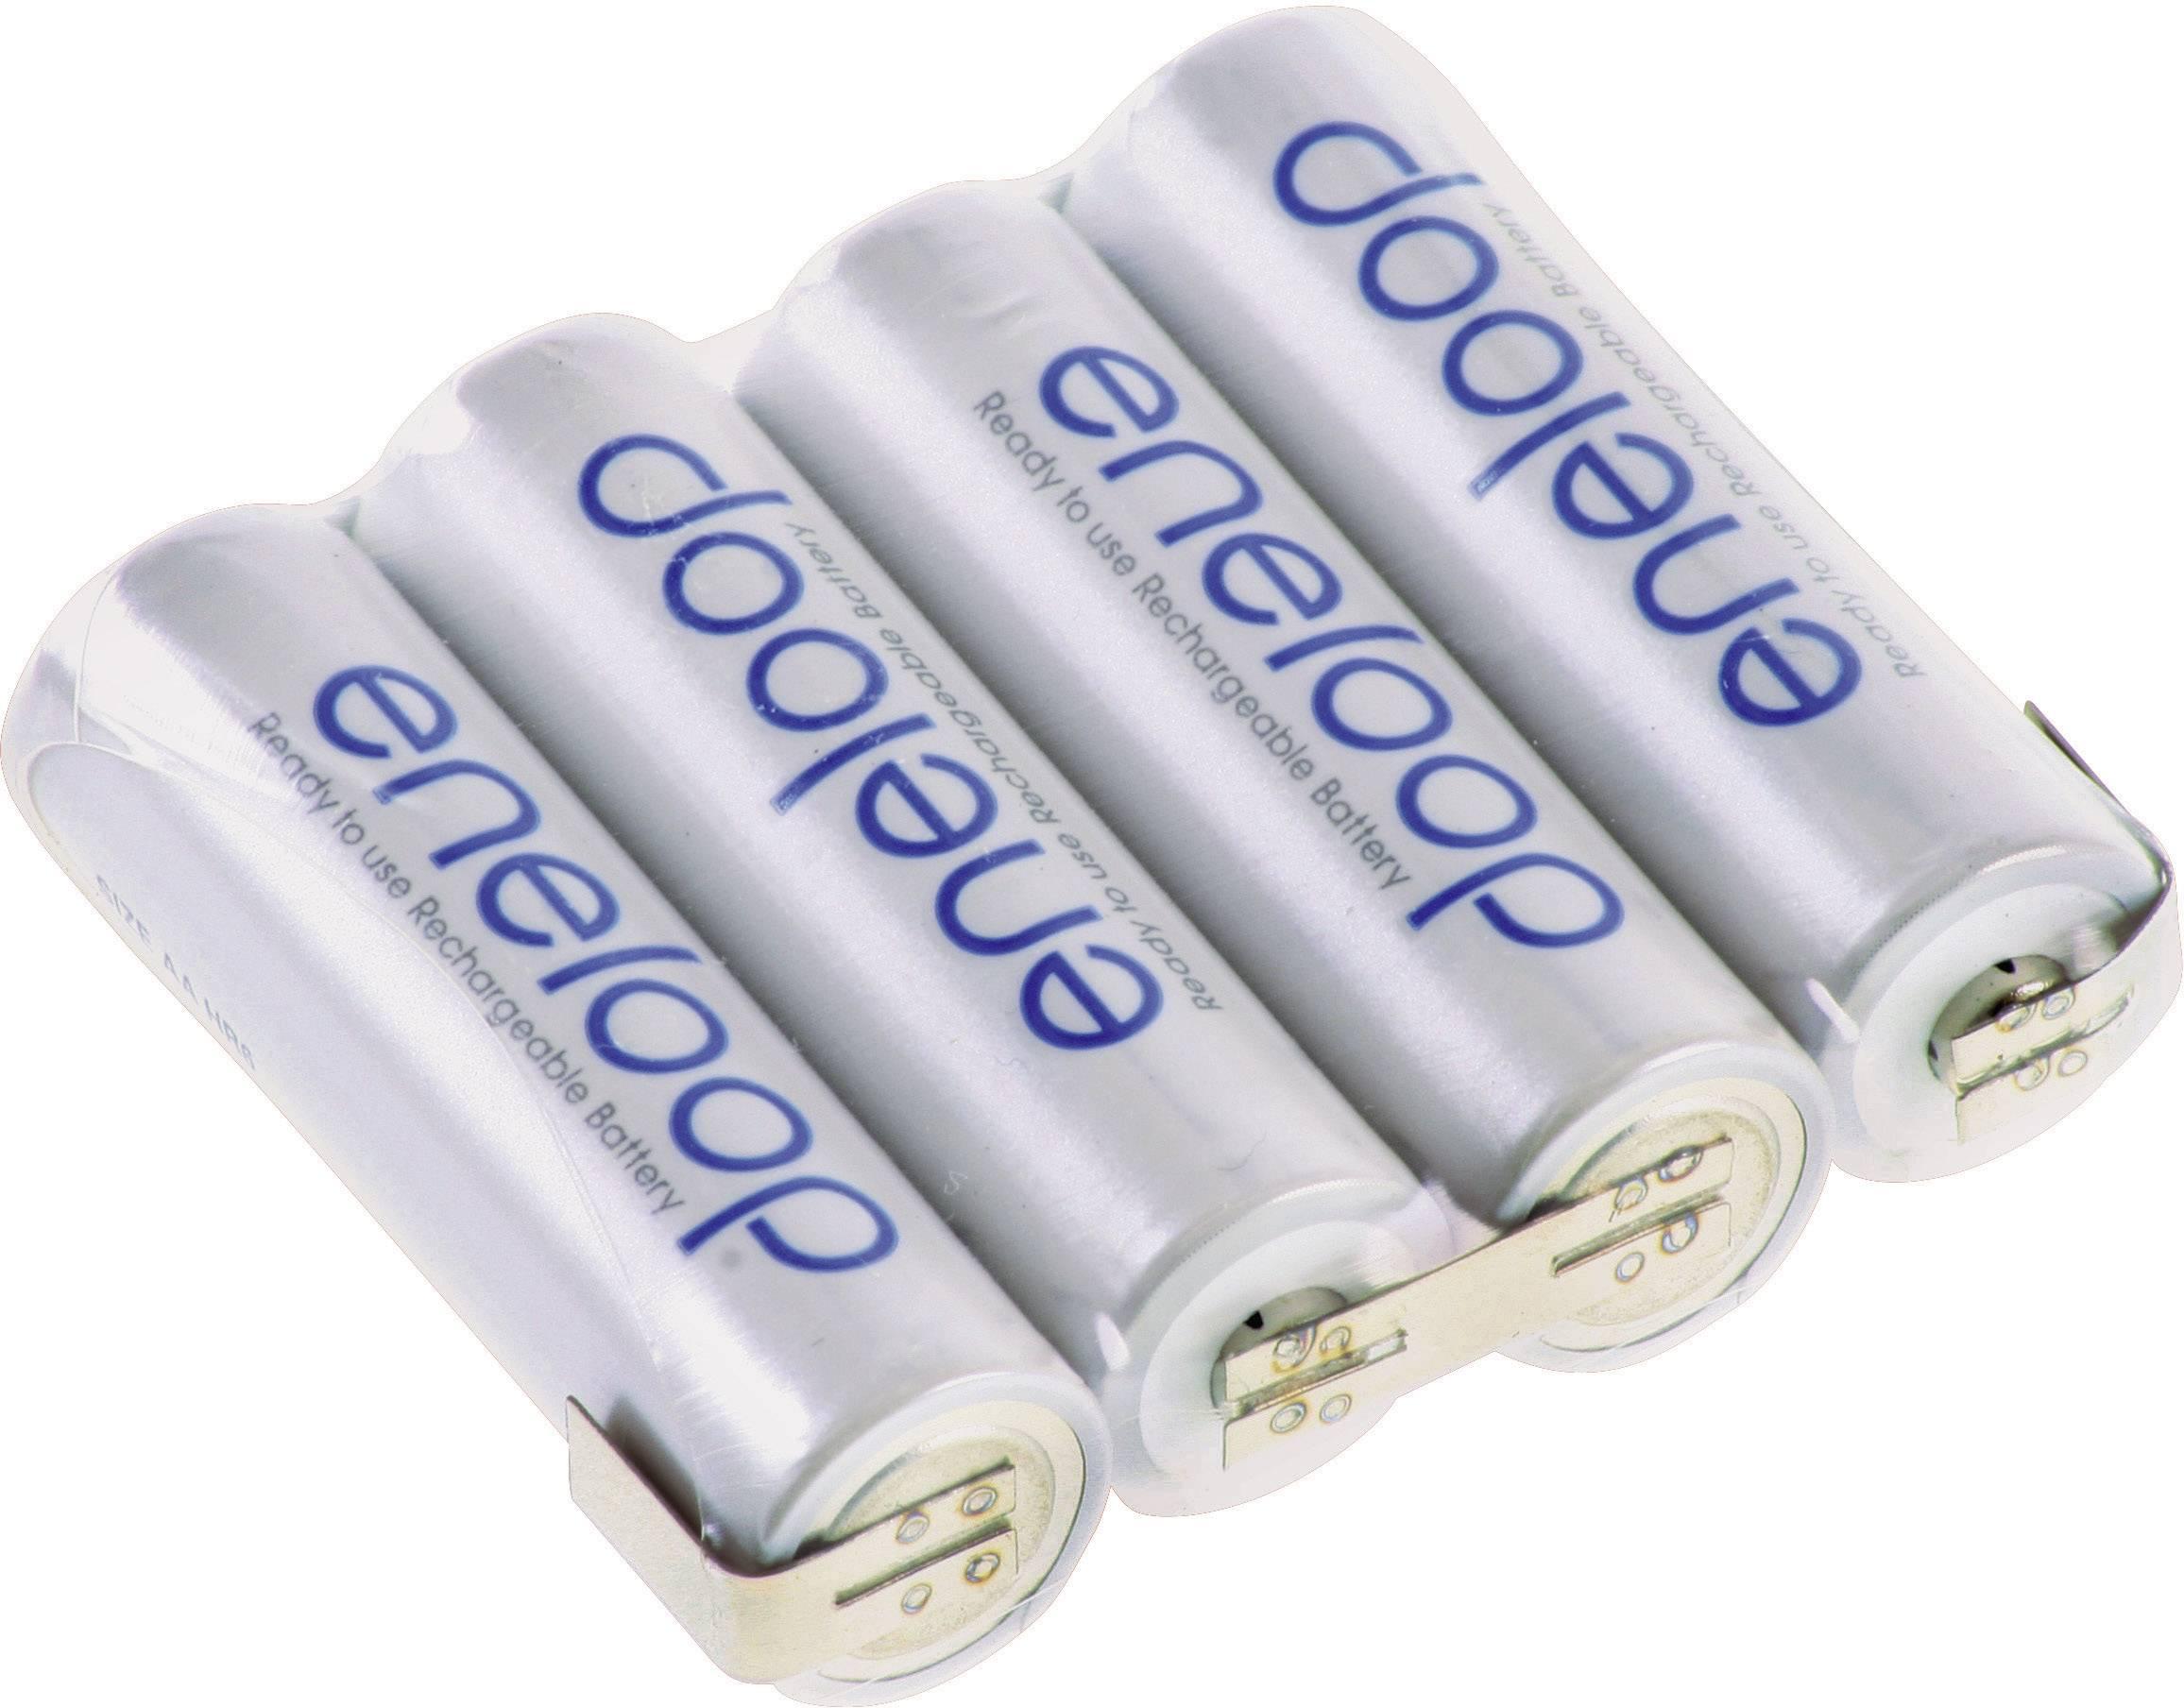 Akupack - sada nabíjacích batérií NiMH 4 mignon (AA) Panasonic eneloop Reihe F1x4 126822, 1900 mAh, 4.8 V